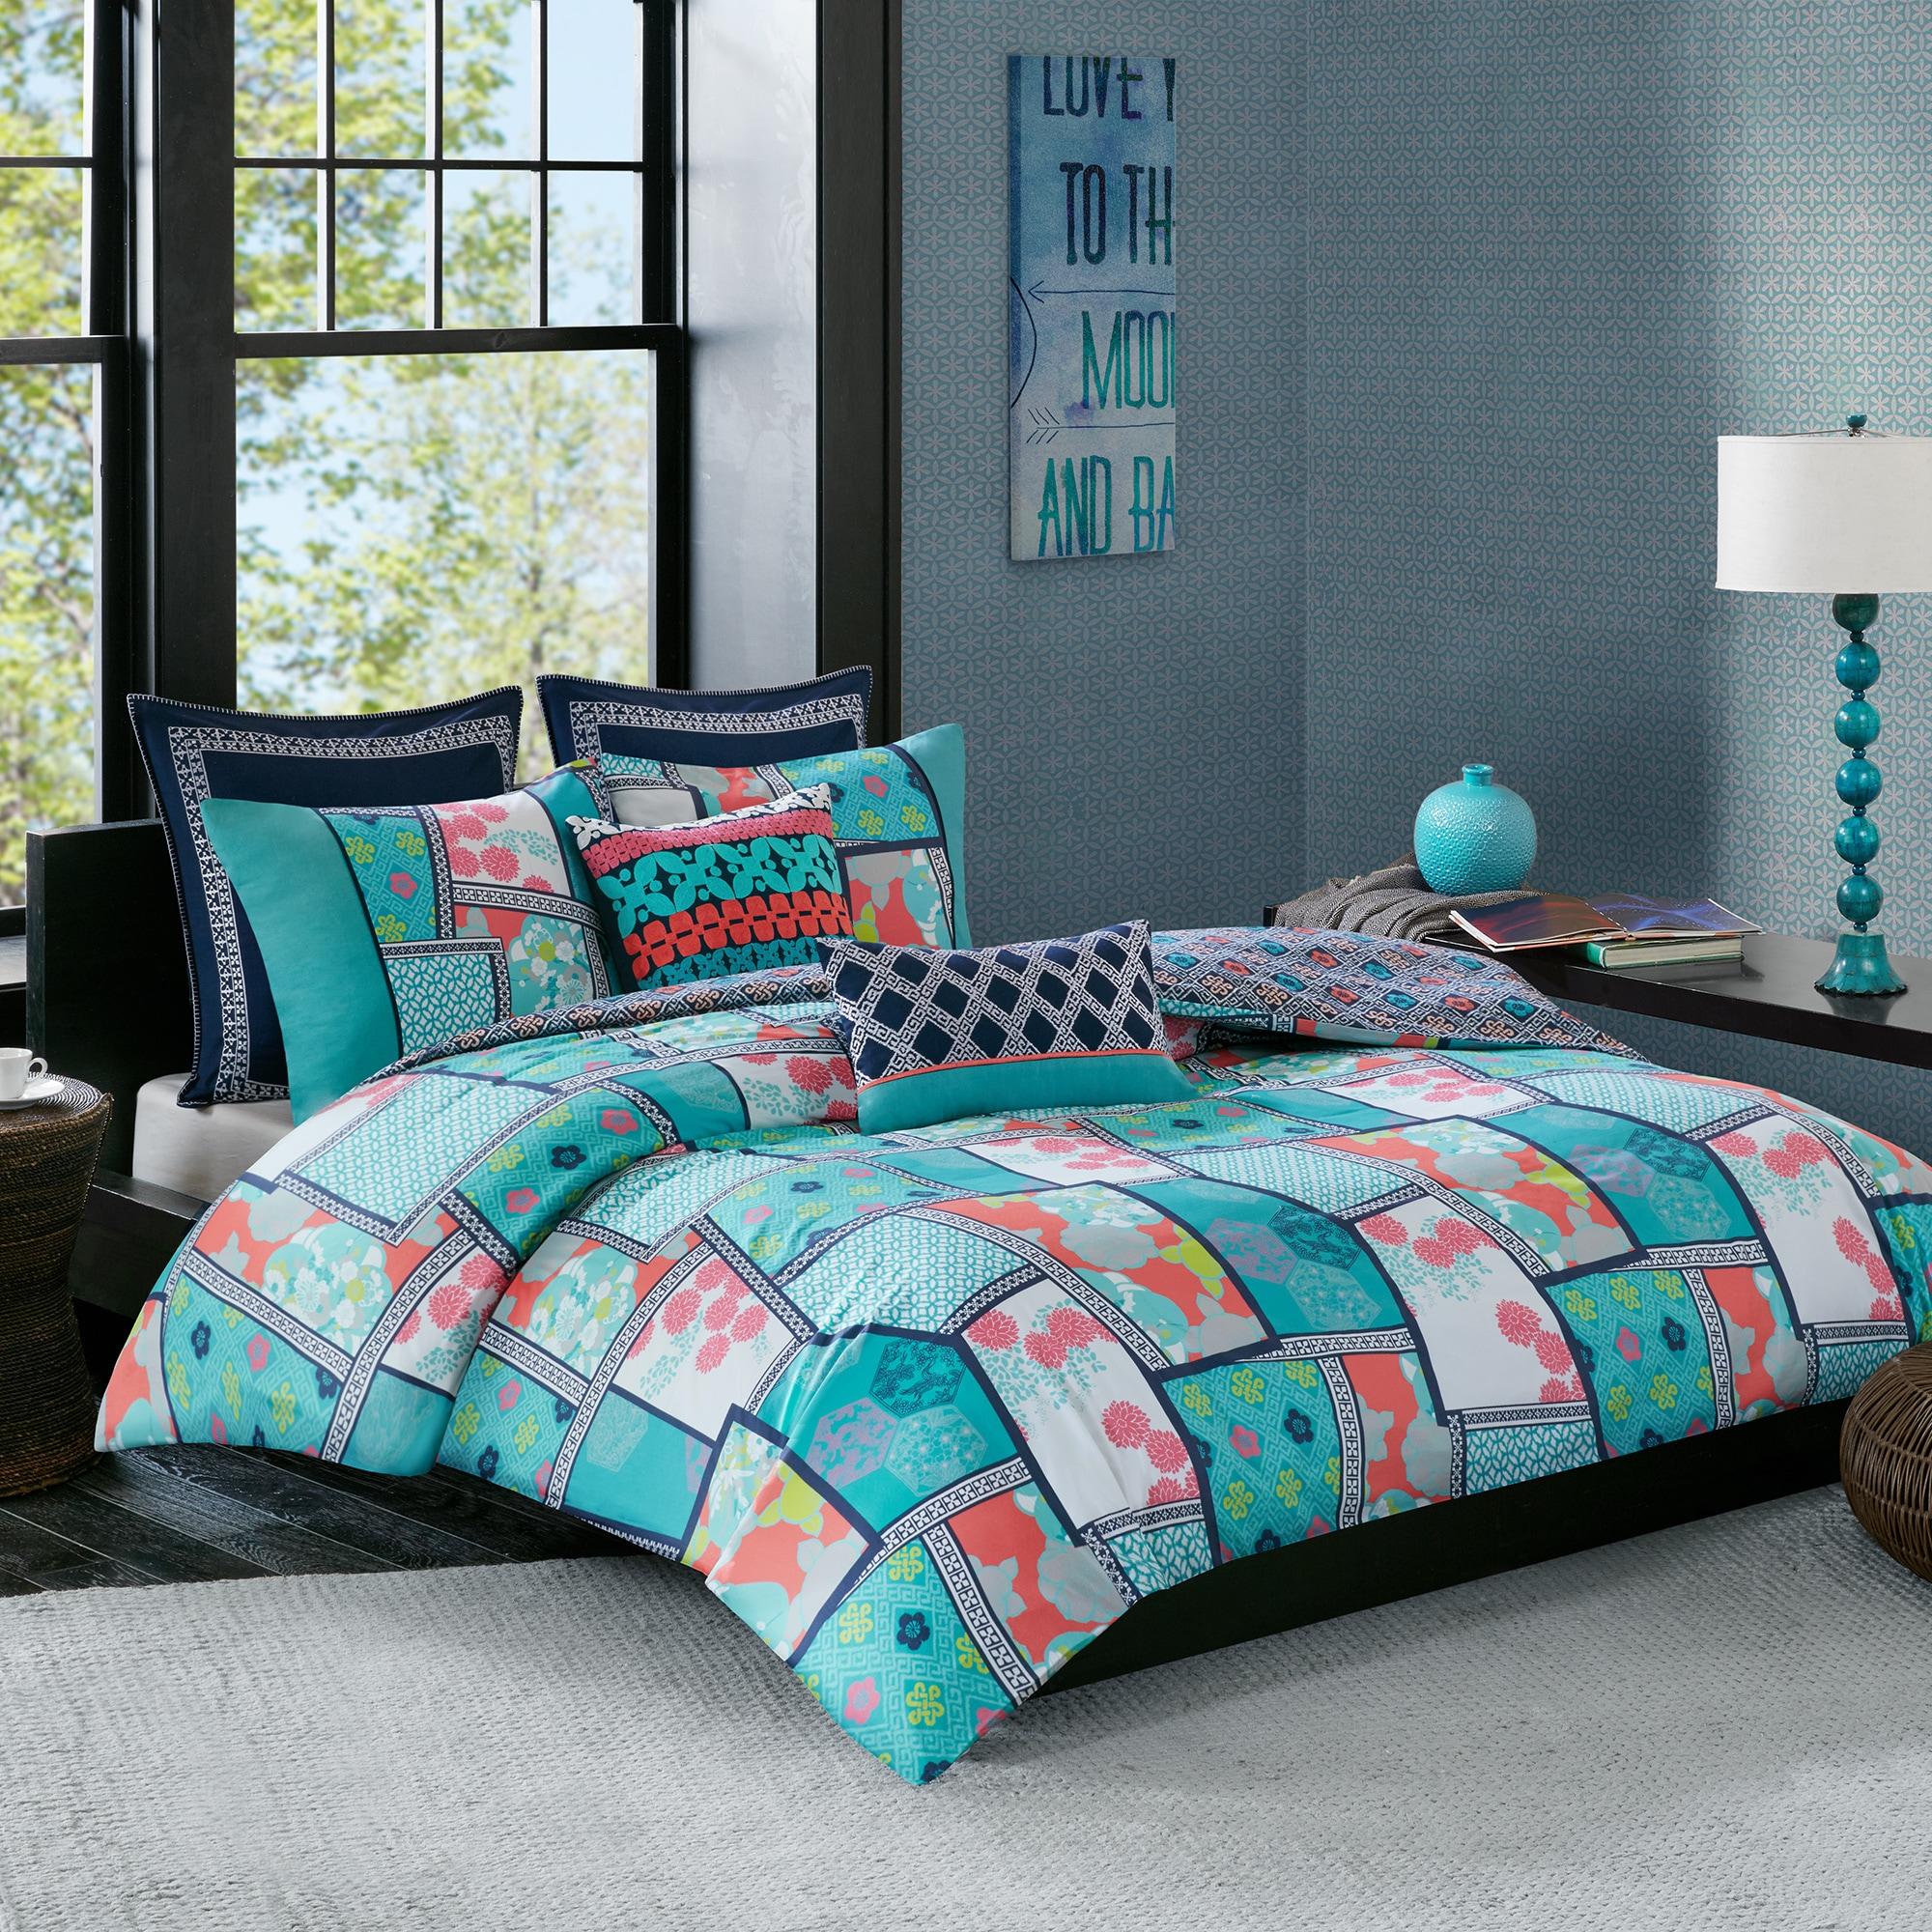 Josie By Natori Mix And Match Multi 250tc Cotton Printed Reversible Comforter 3 Piece Set Overstock 14199632